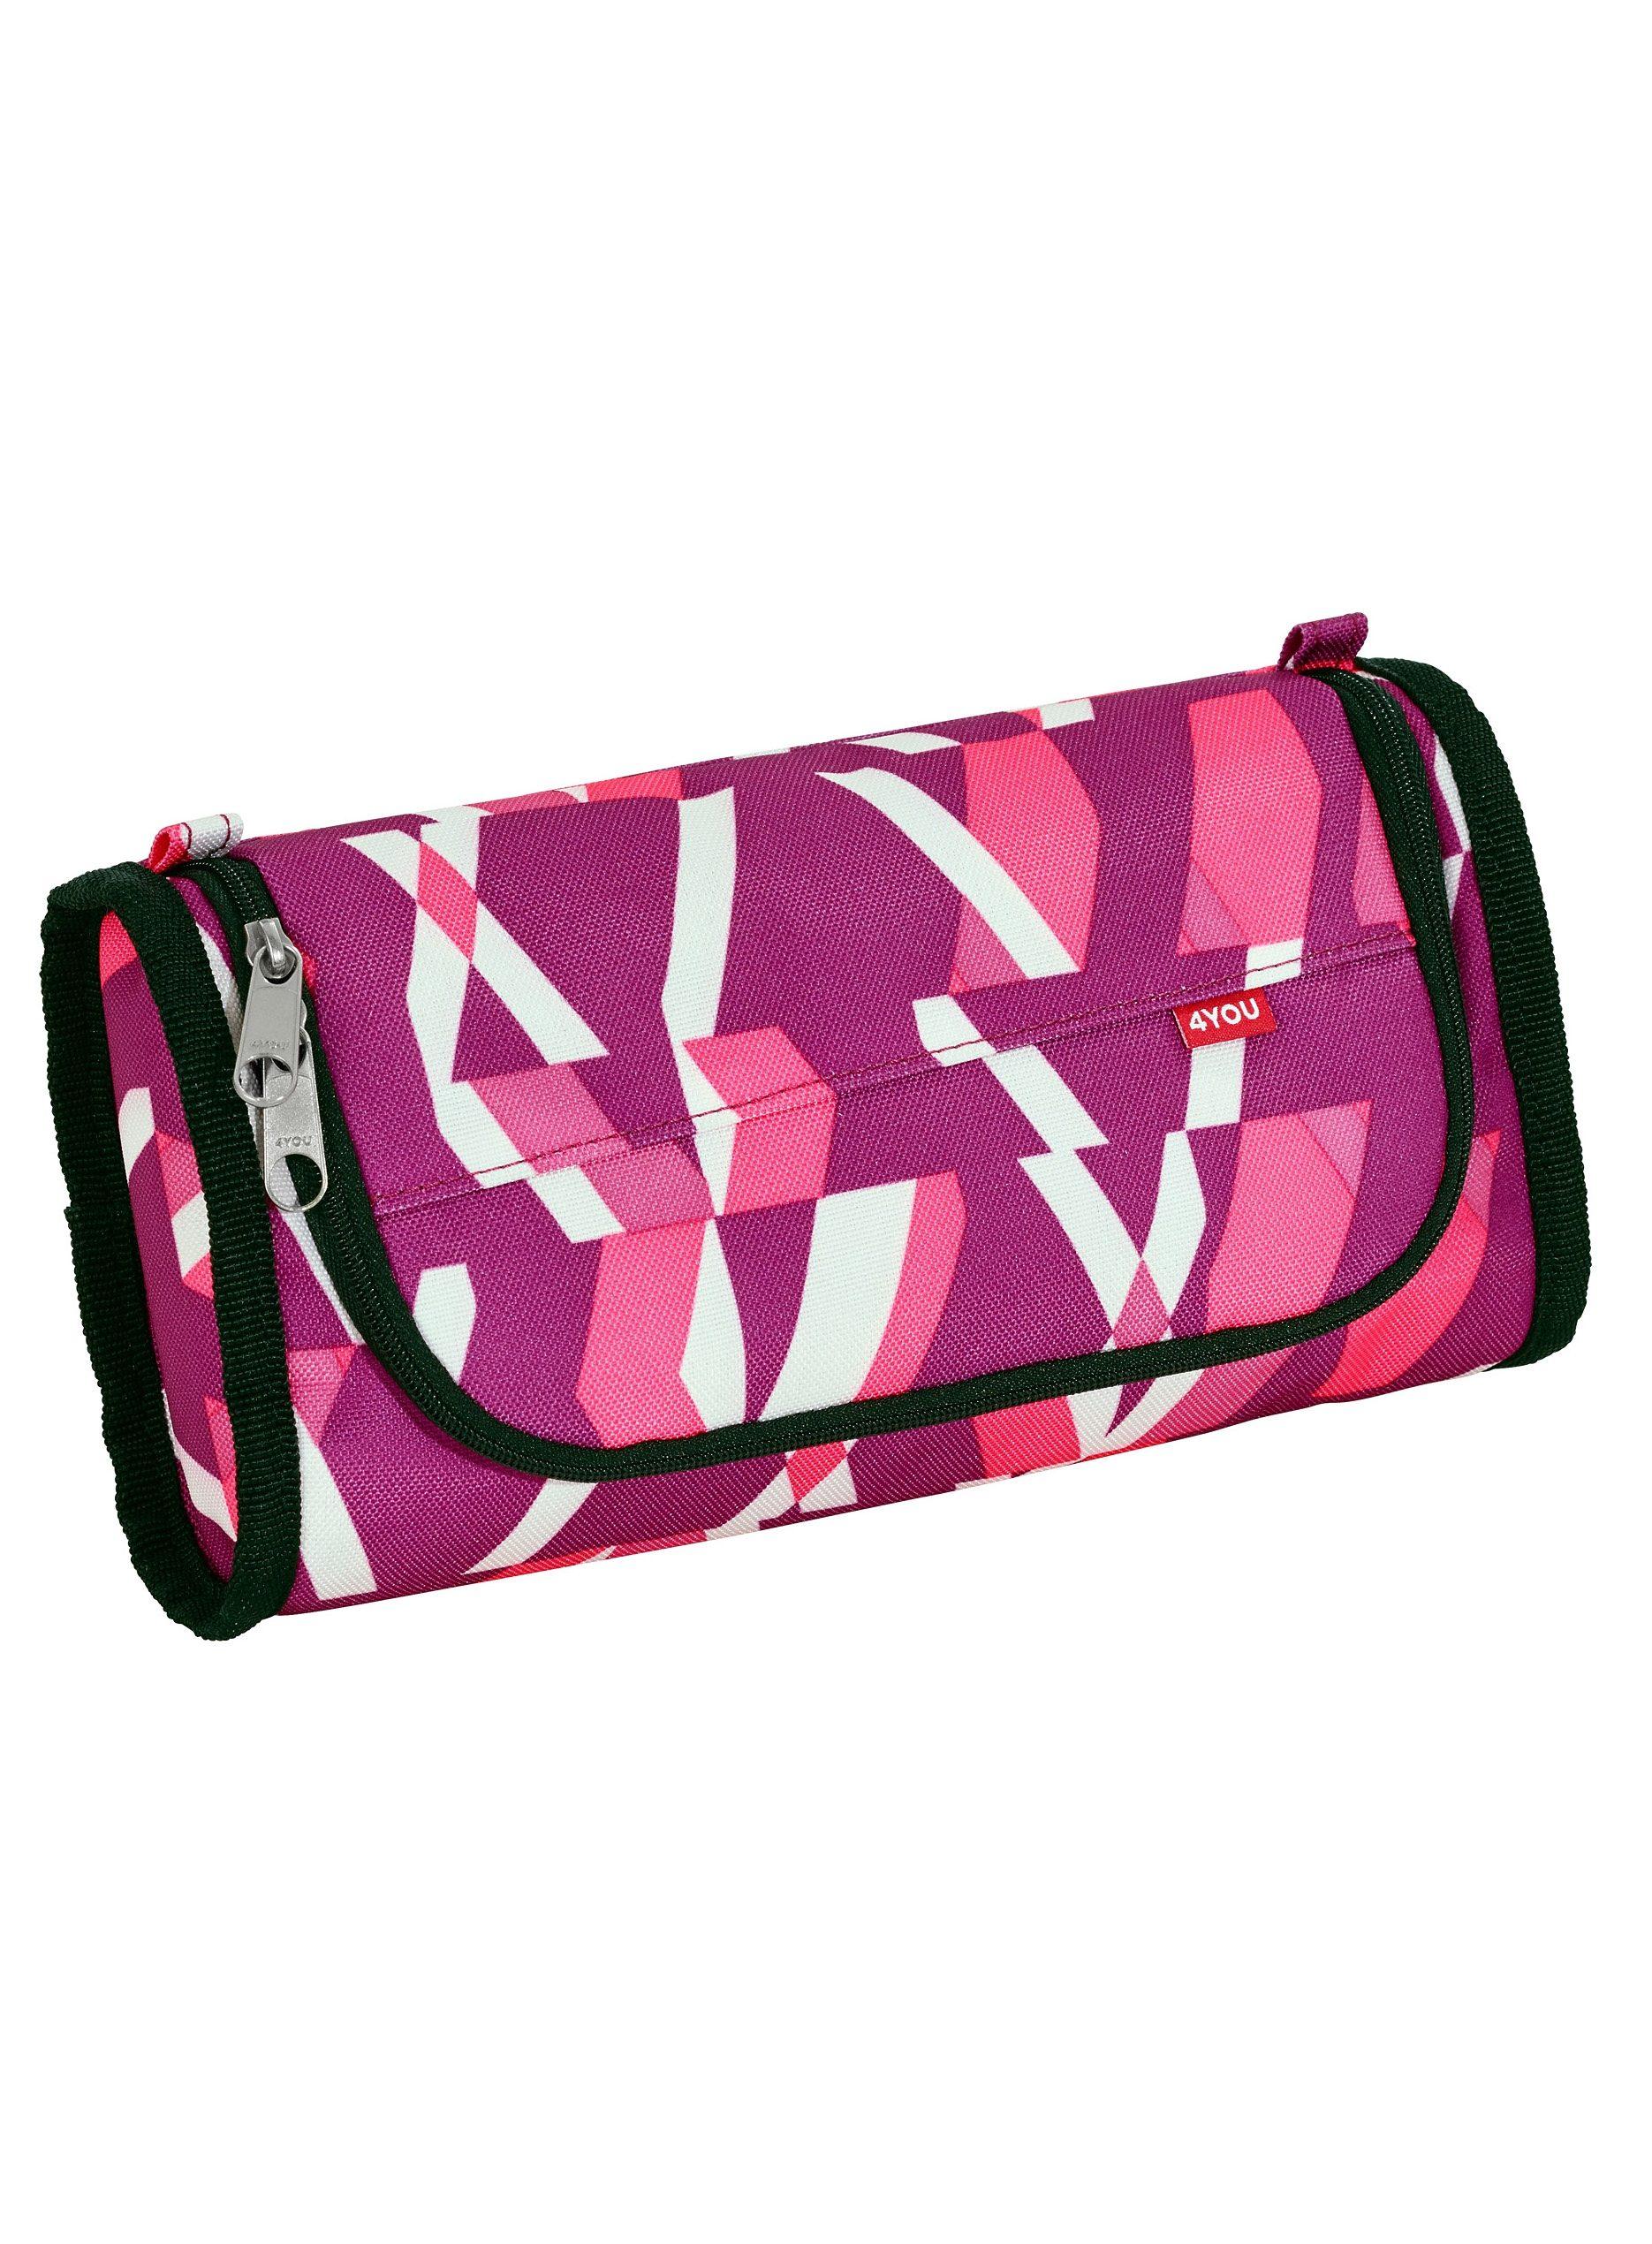 4YOU Mäppchen, Chequer Pink, »PenBox«